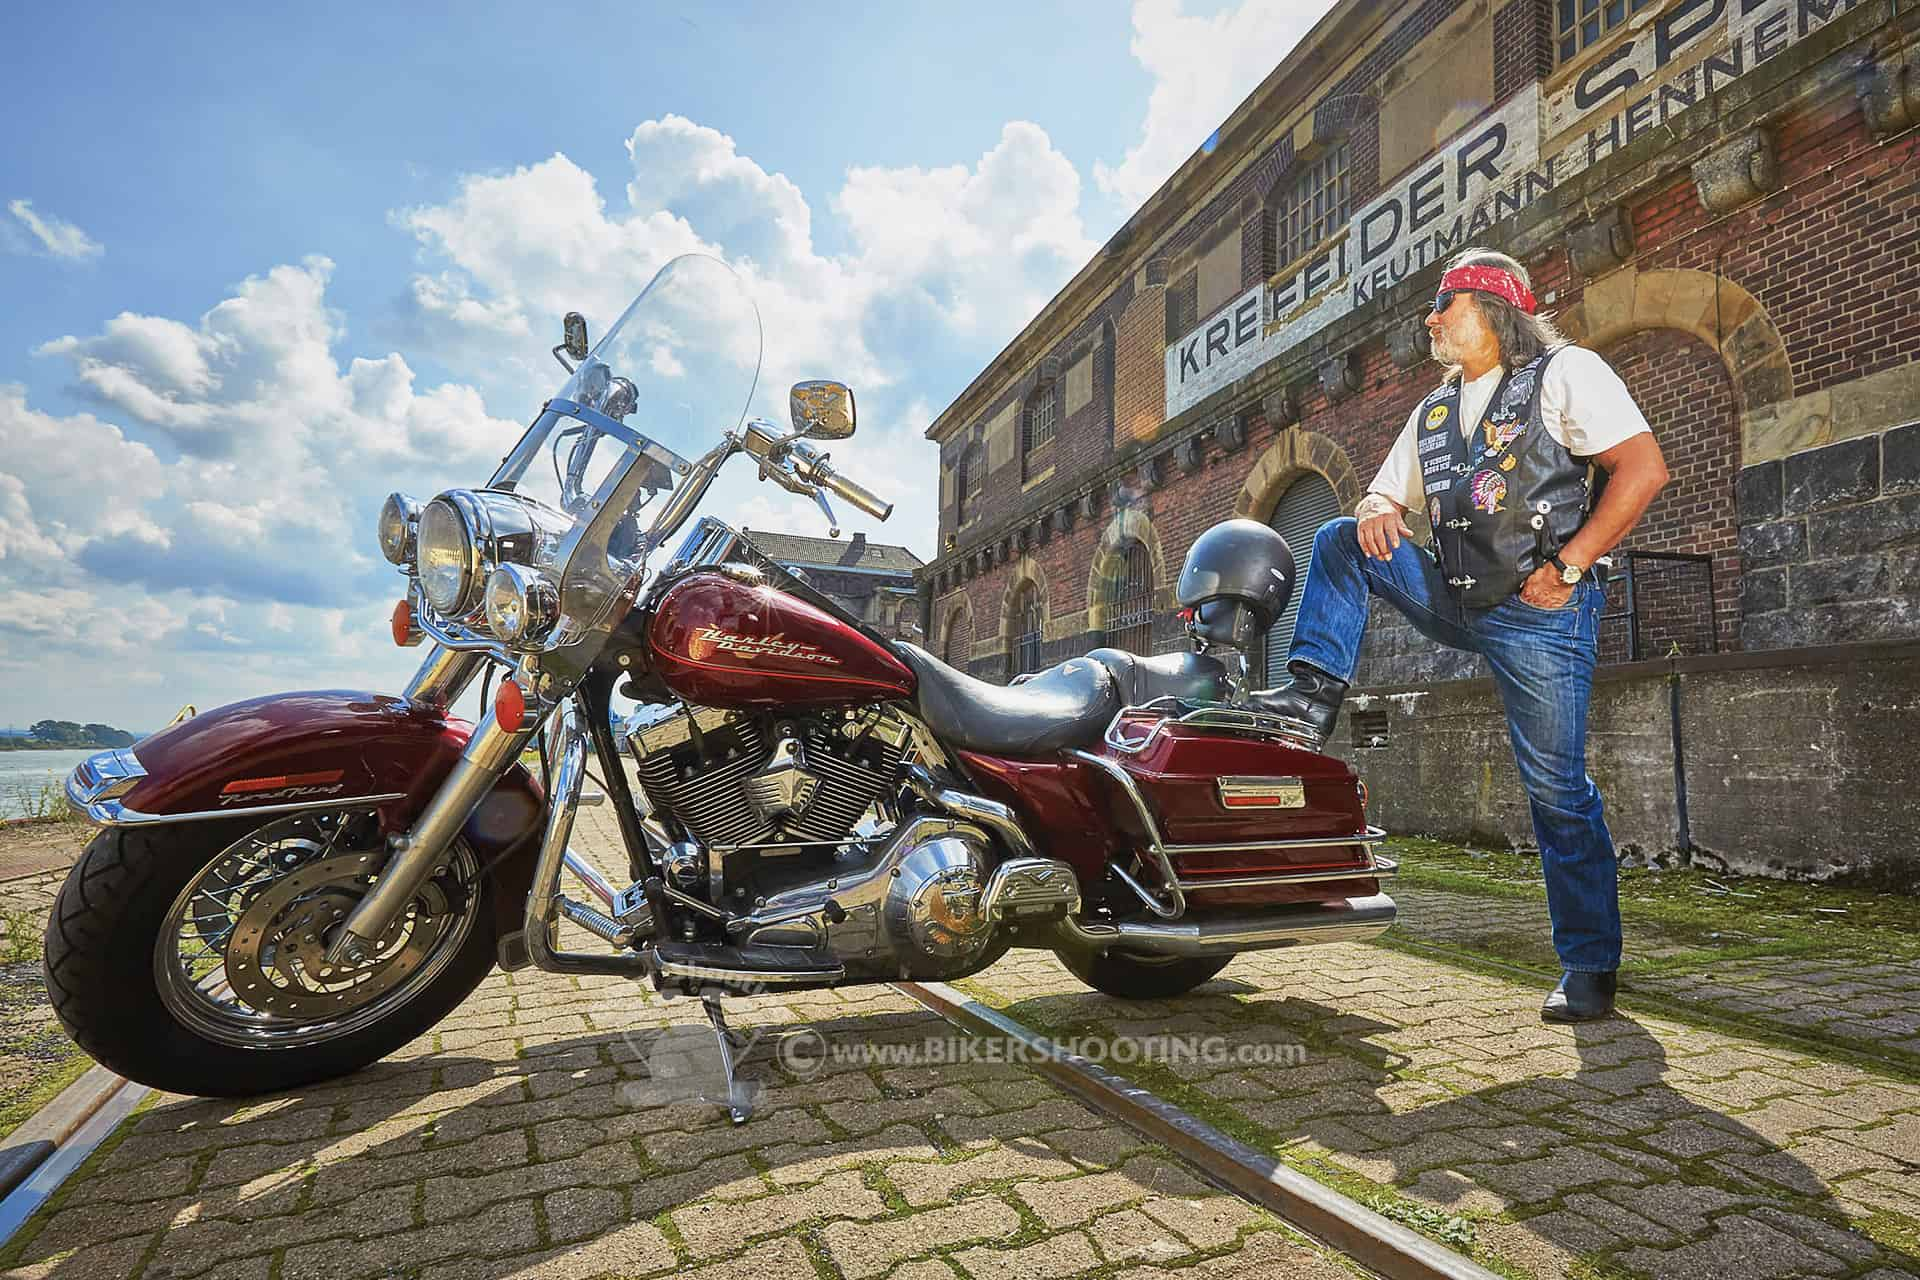 Biker Fotoshooting SPECIAL Fotoshooting motorrad shooting, biker fotoshooting, fotoshooting mit motorrad,